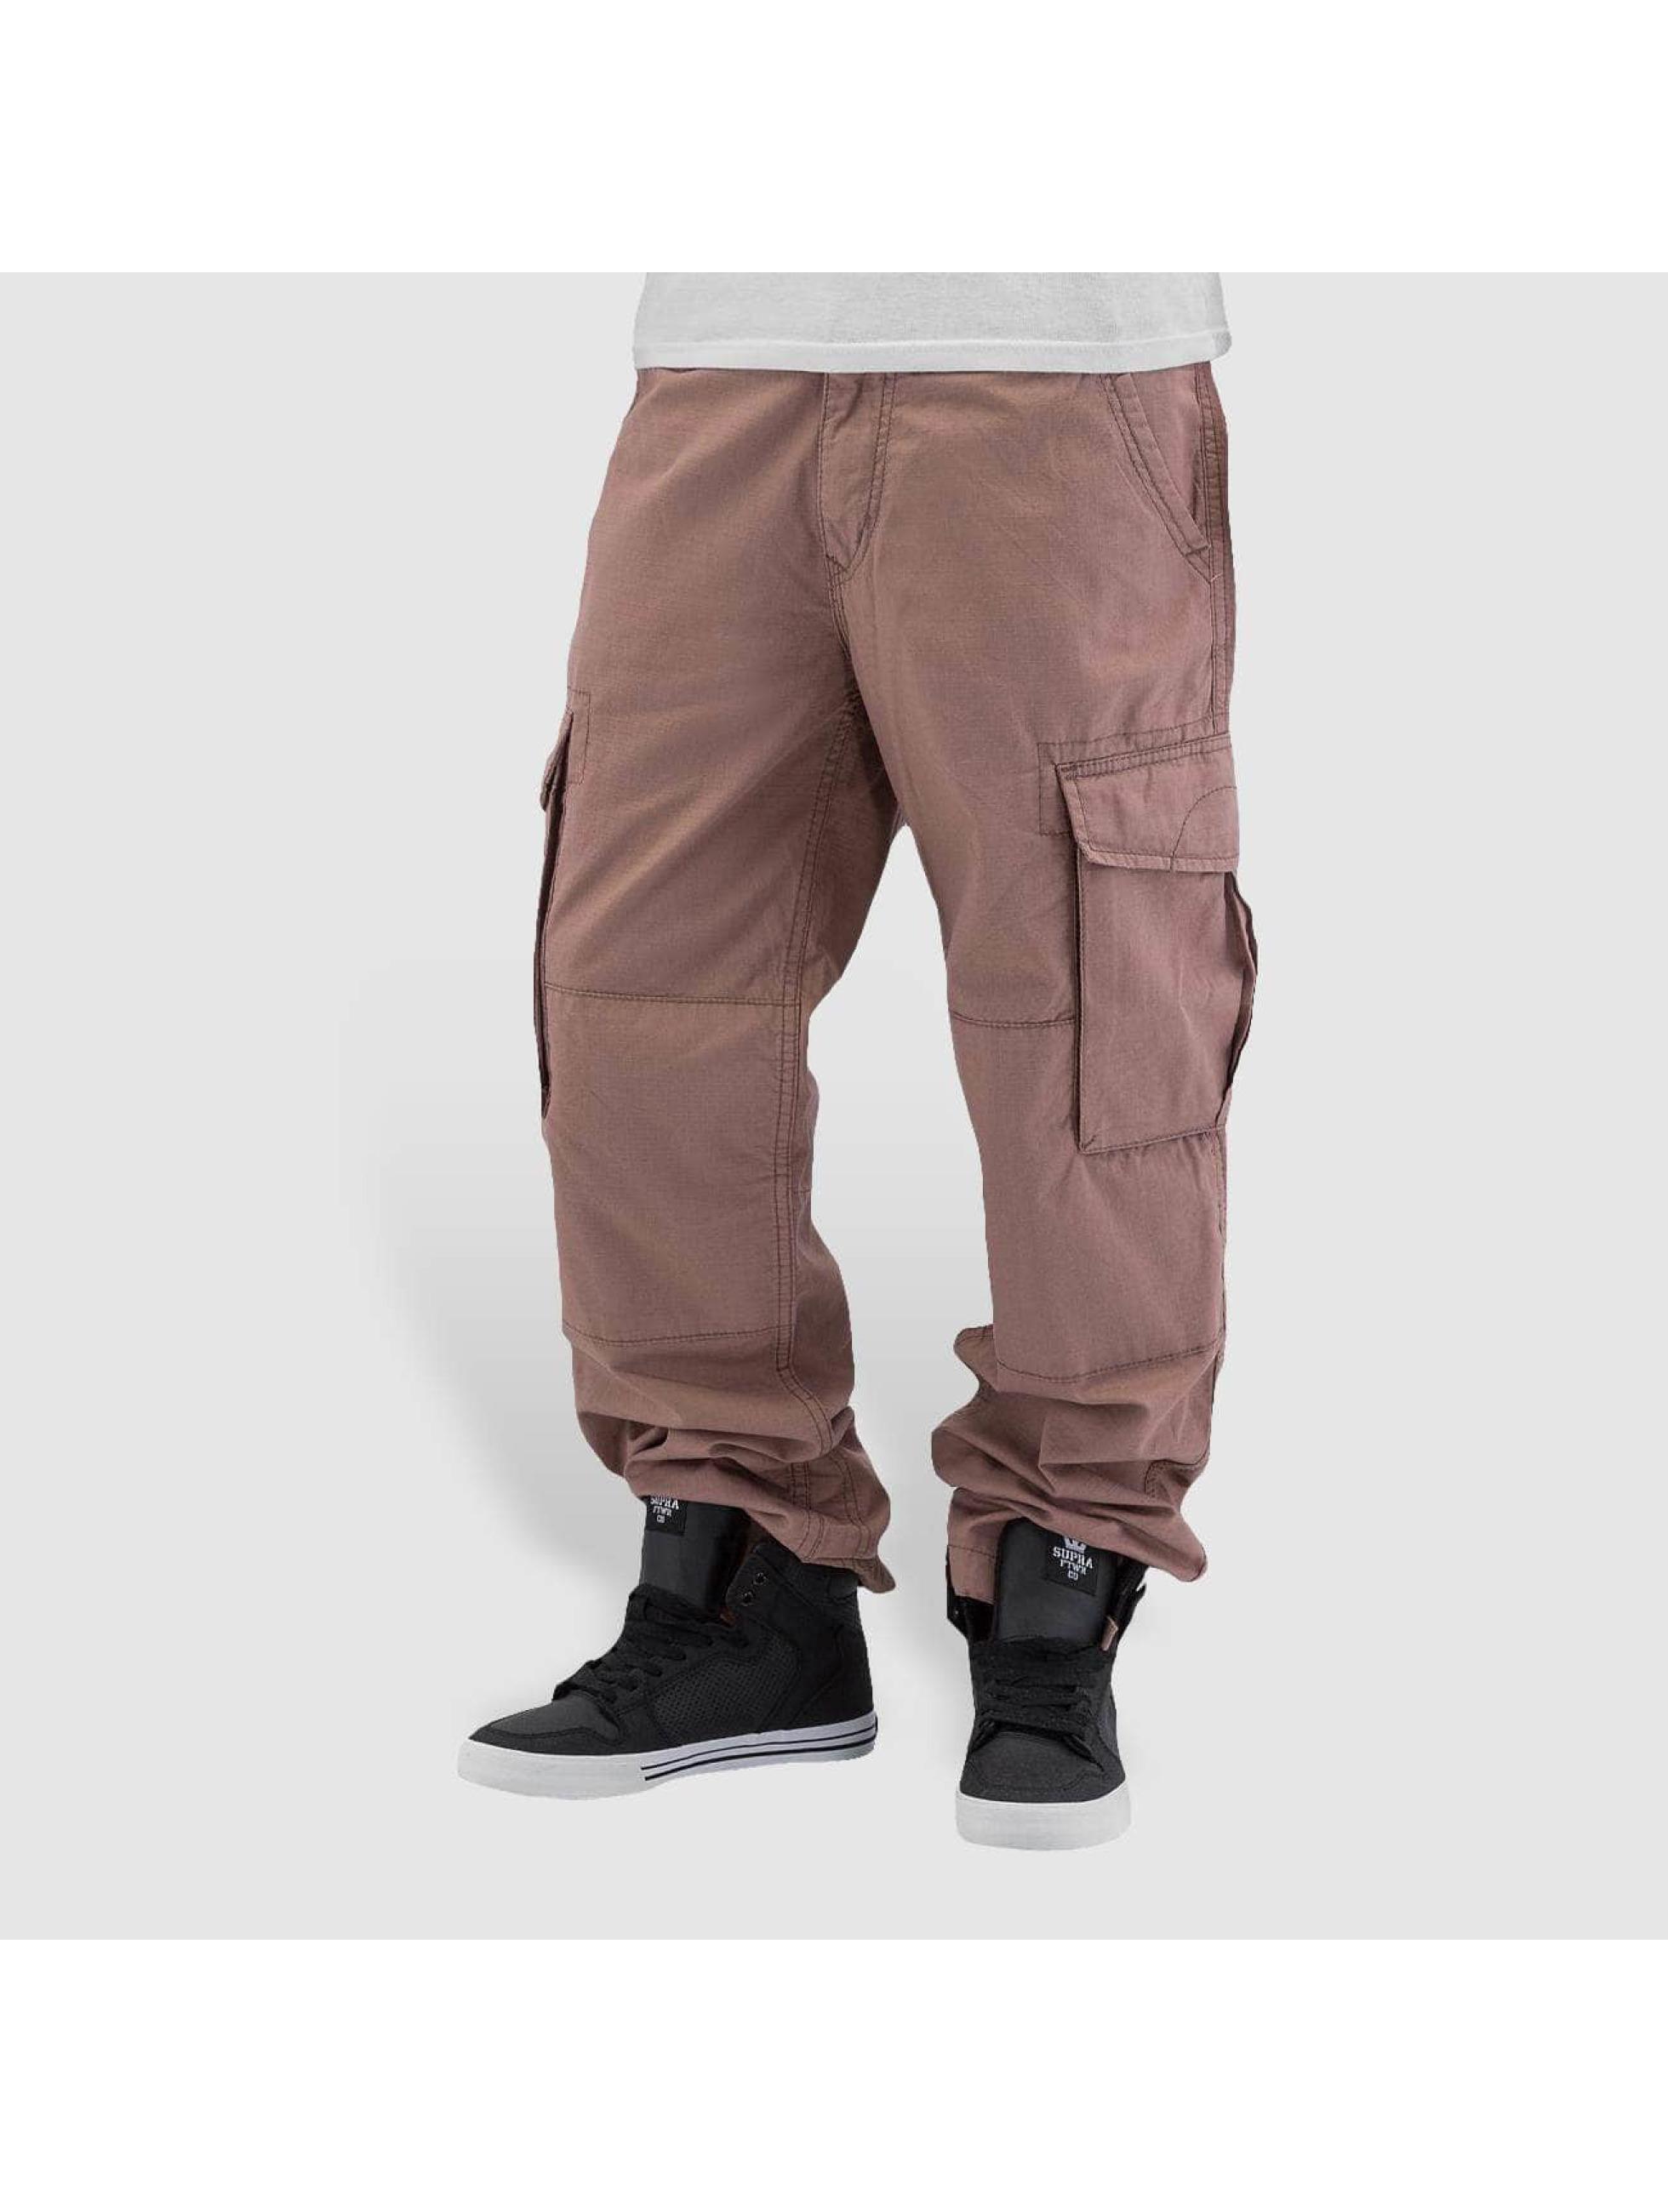 Reell Jeans Reisitaskuhousut Ripstop beige